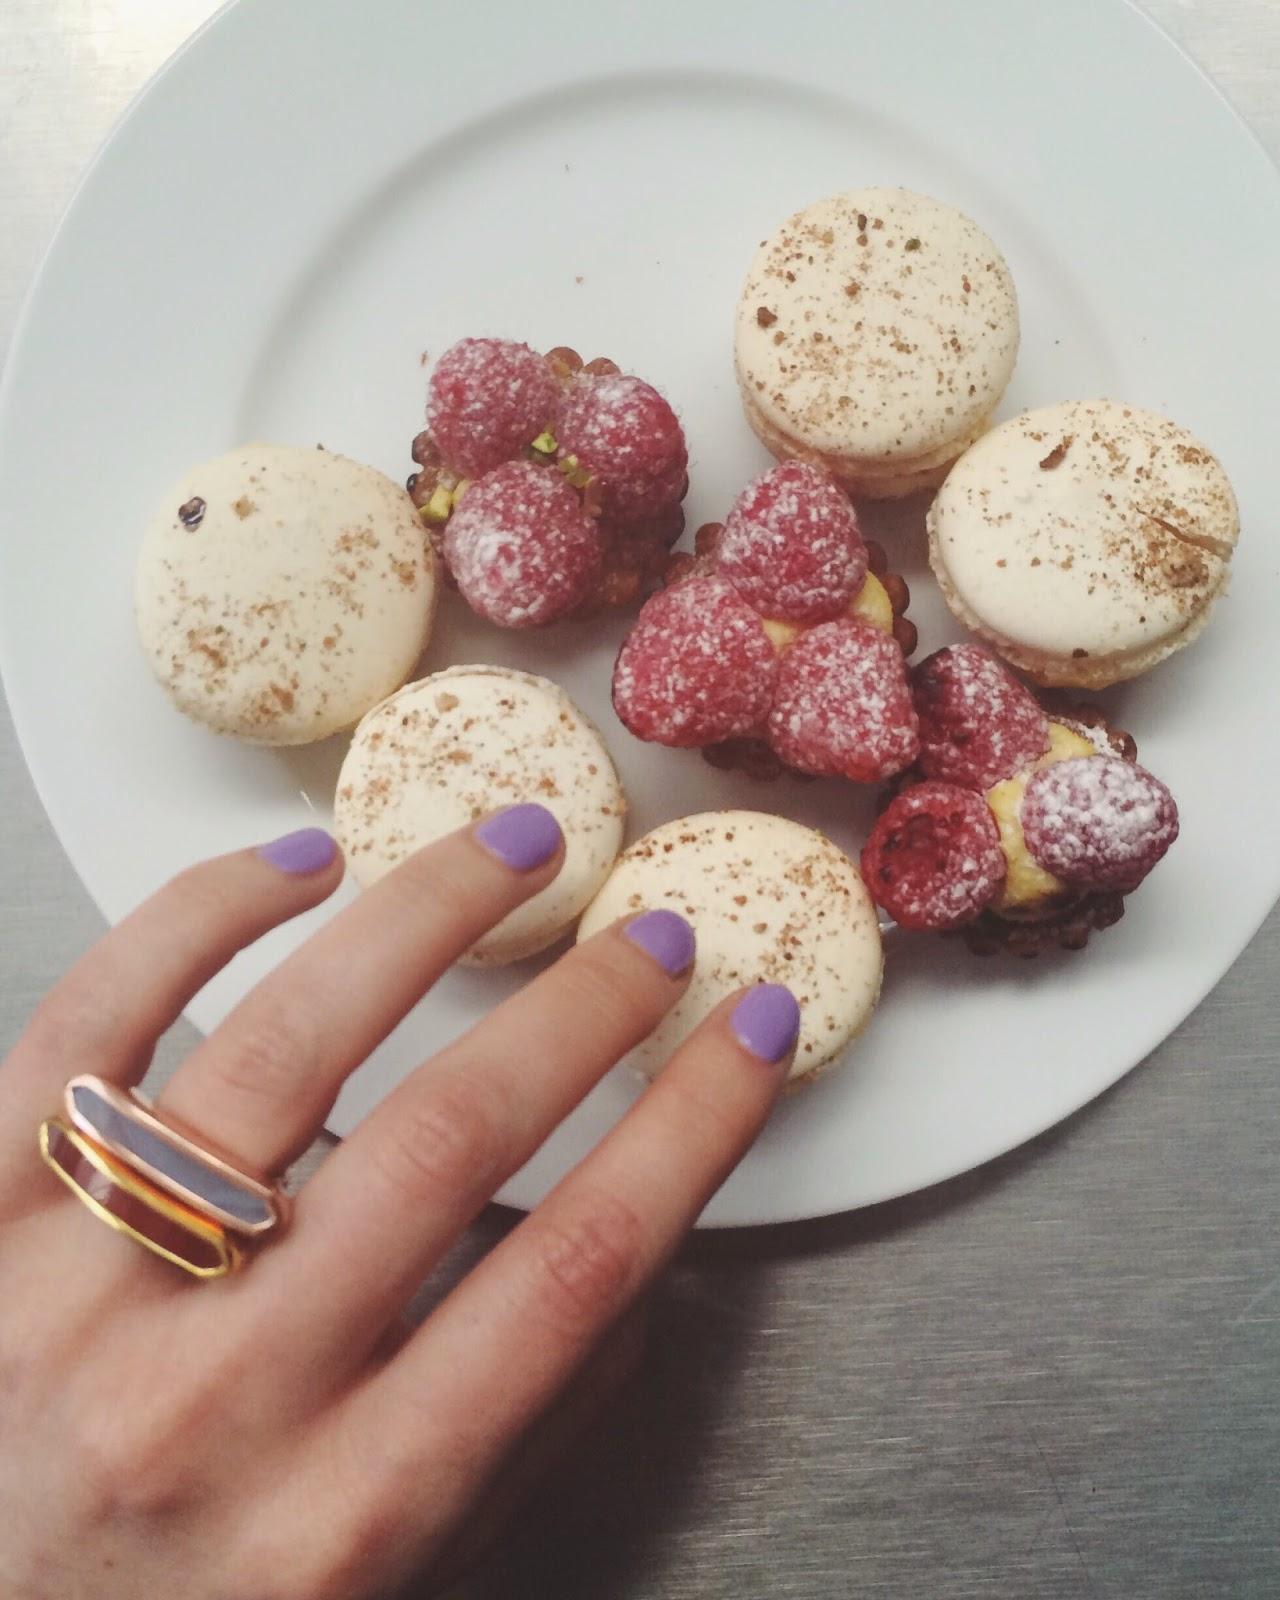 monica vinader baja rings, monica vinader jewellery, Nails inc nail polish, nails inc manicure, Aubaine macaroons, macarons